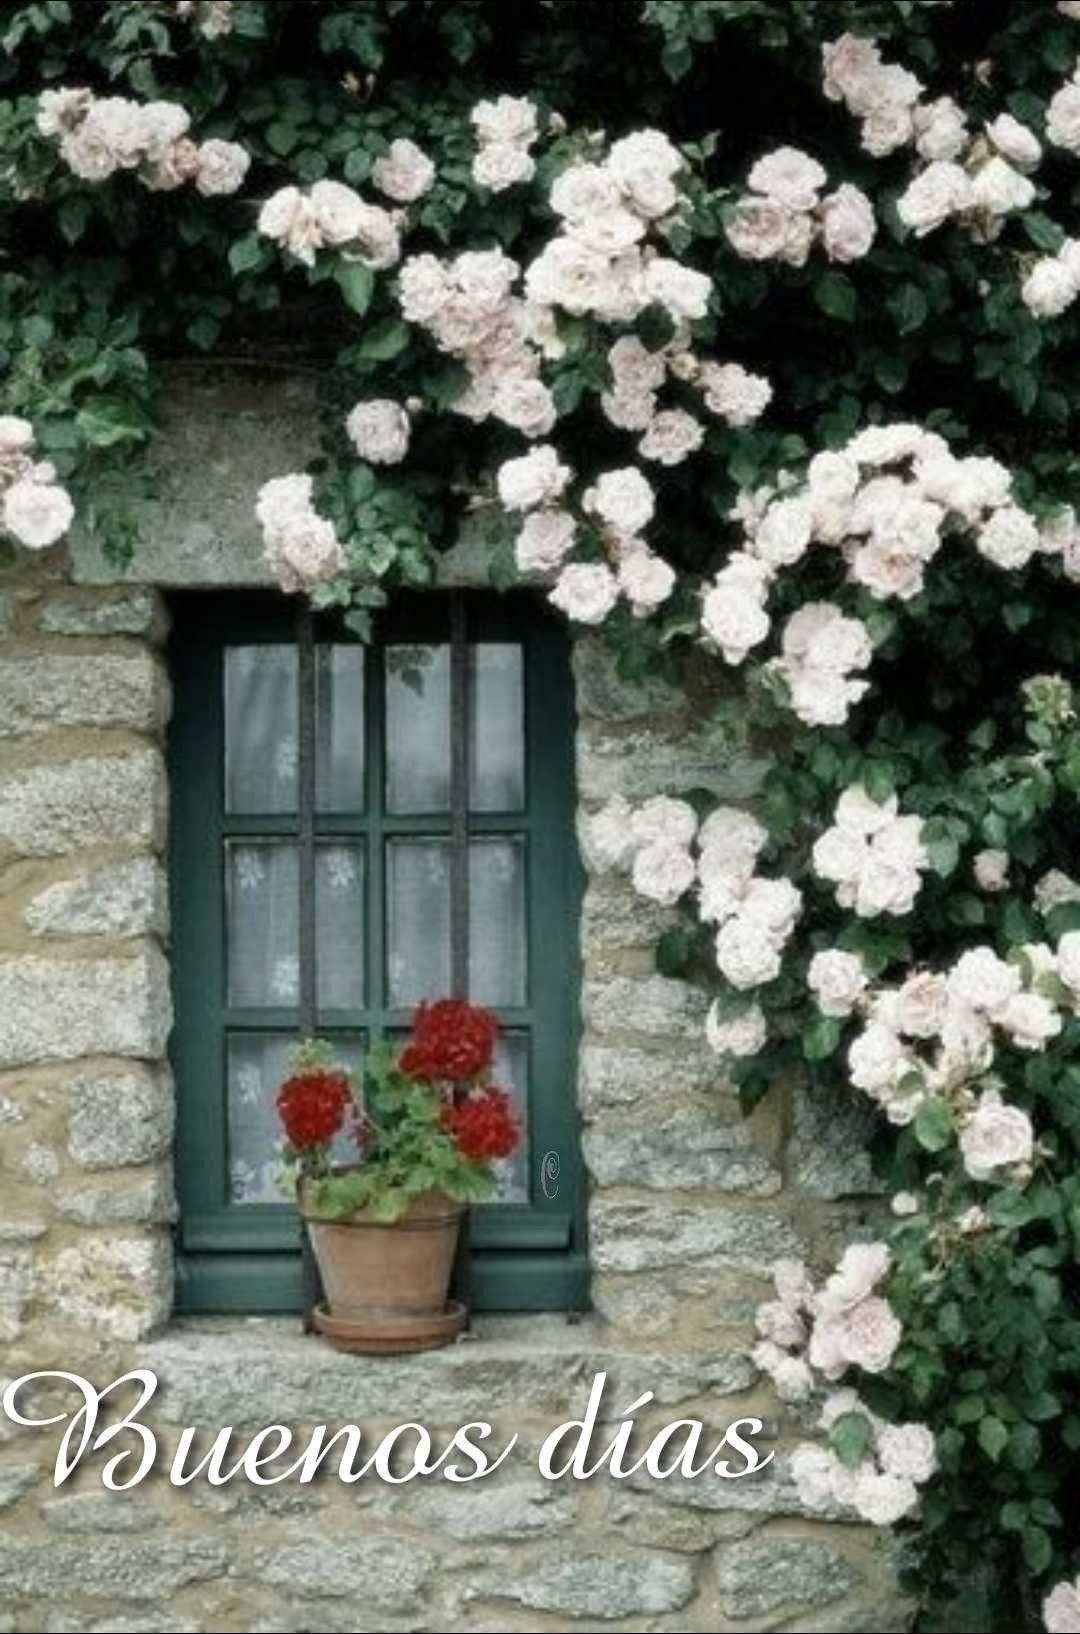 Pin De Diseños Xcaanda En Saludos Climbing Roses Windows